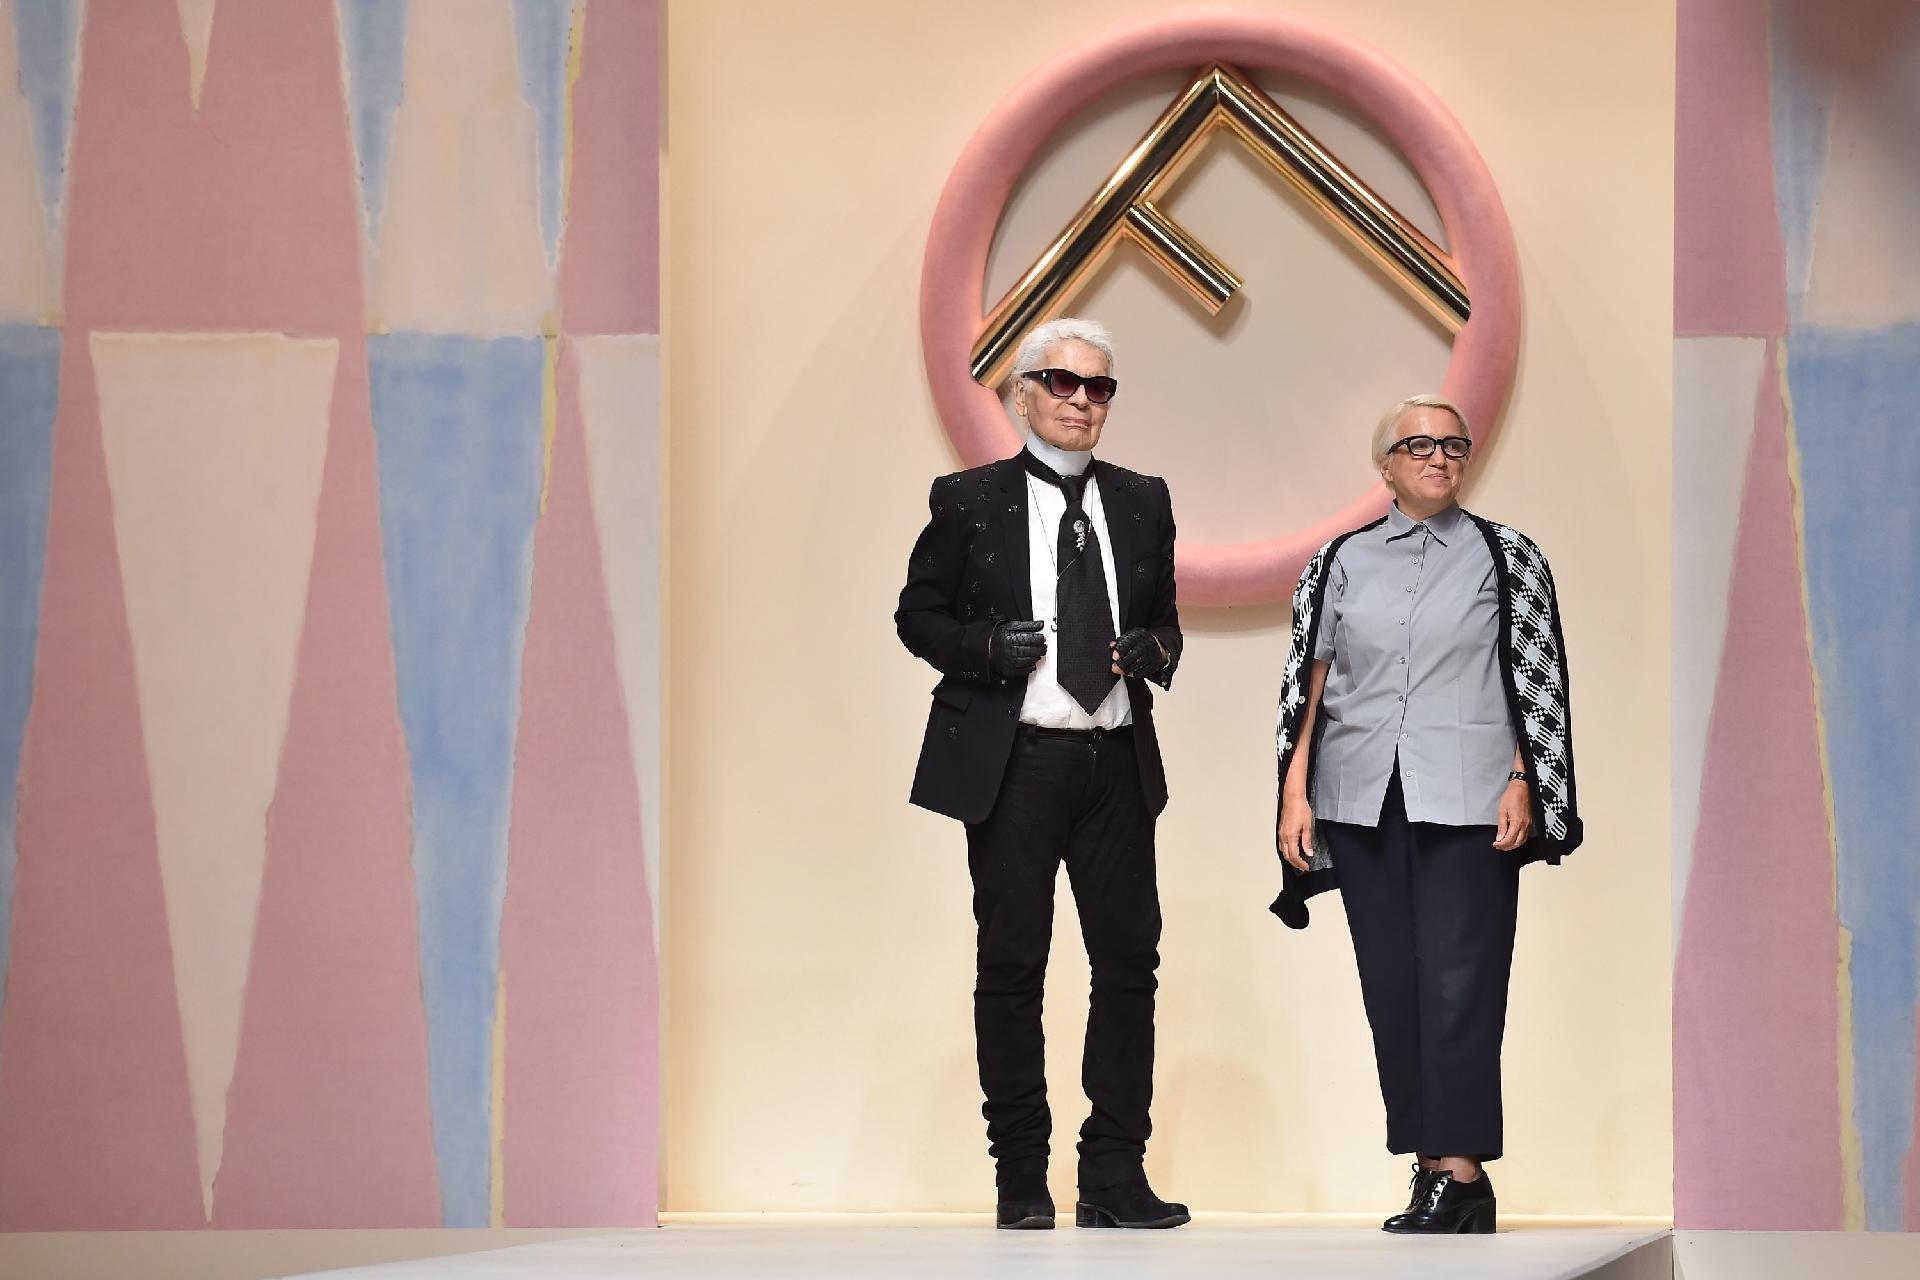 8da4b625947dc Neta de fundadores vai substituir Karl Lagerfeld na Fendi - 21 02 2019 -  UOL Universa